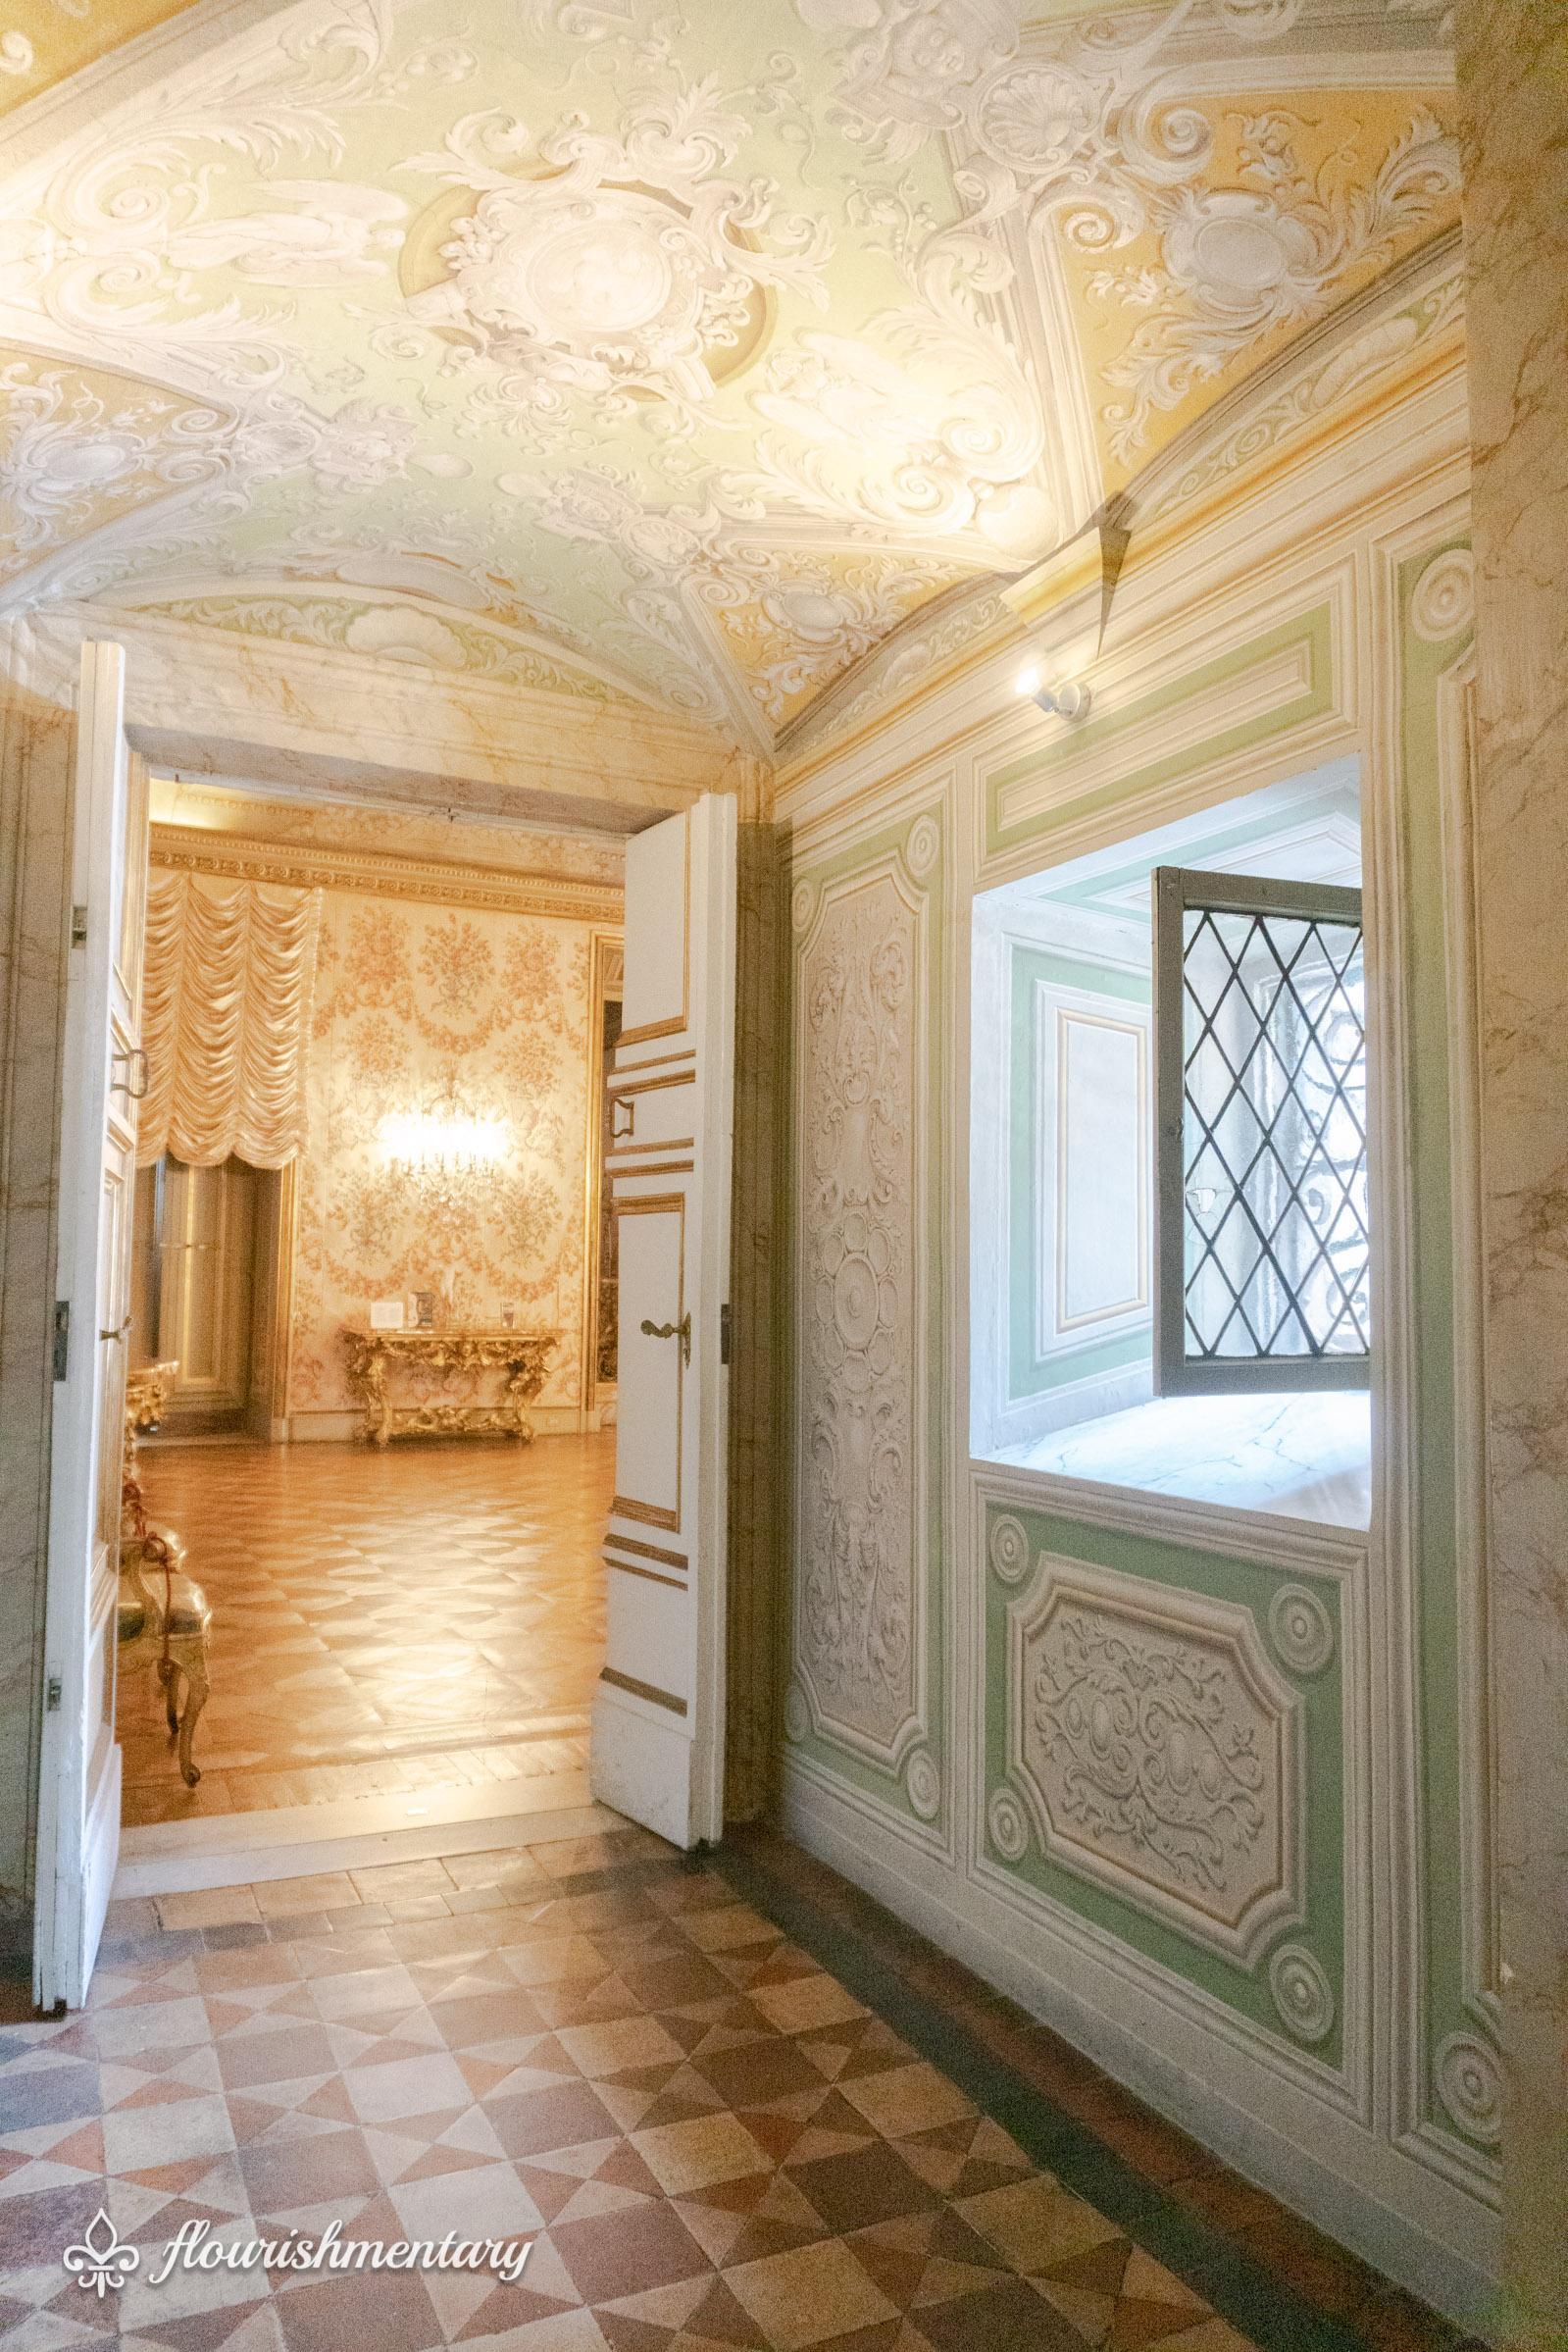 Hallway leading to the Doria Pamphilj chapel